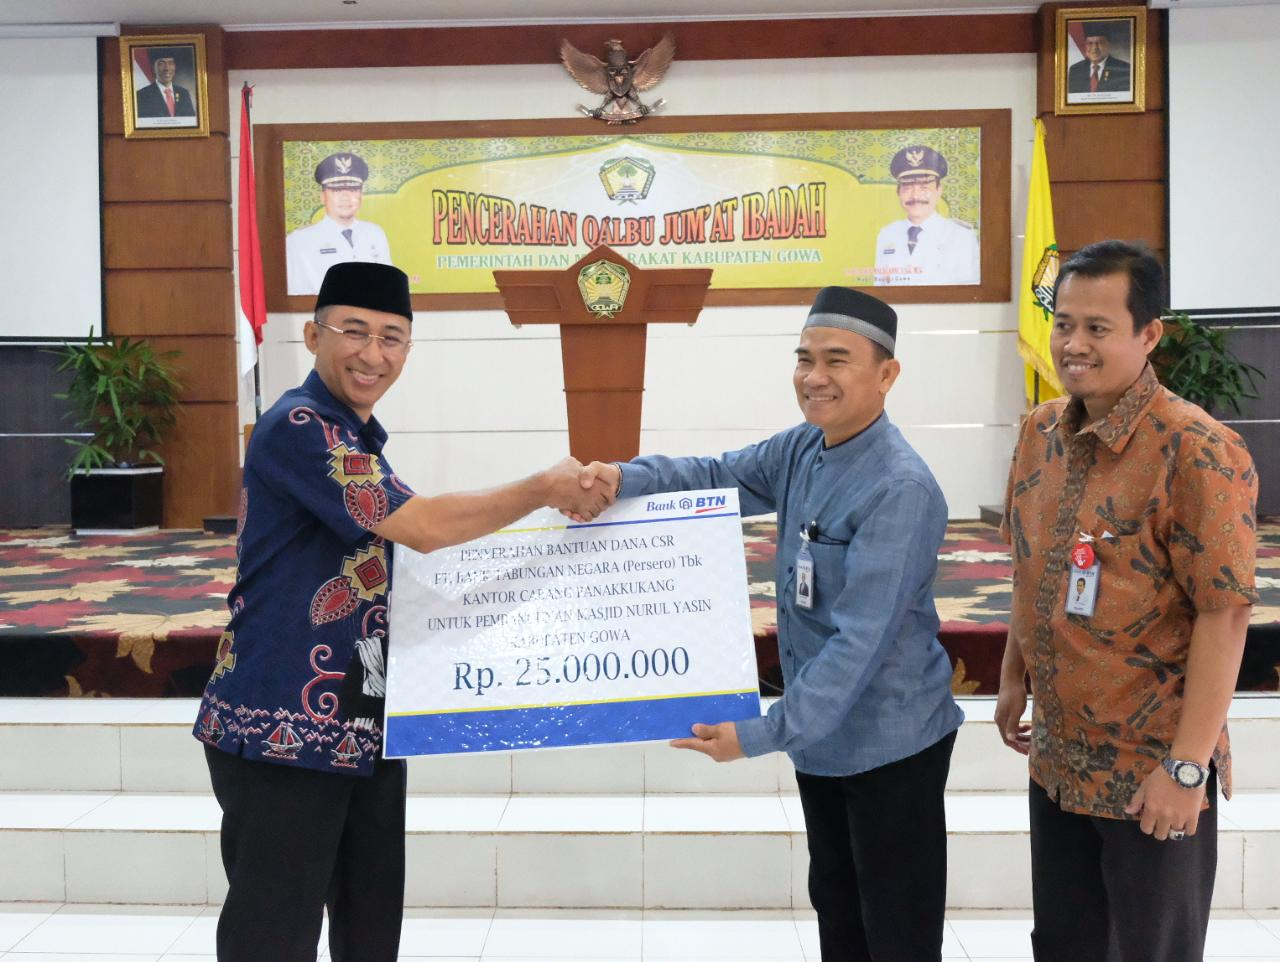 Masjid Nurul Yasin Kantor Bupati Gowa Dapat Bantuan CSR Rp 25 Juta